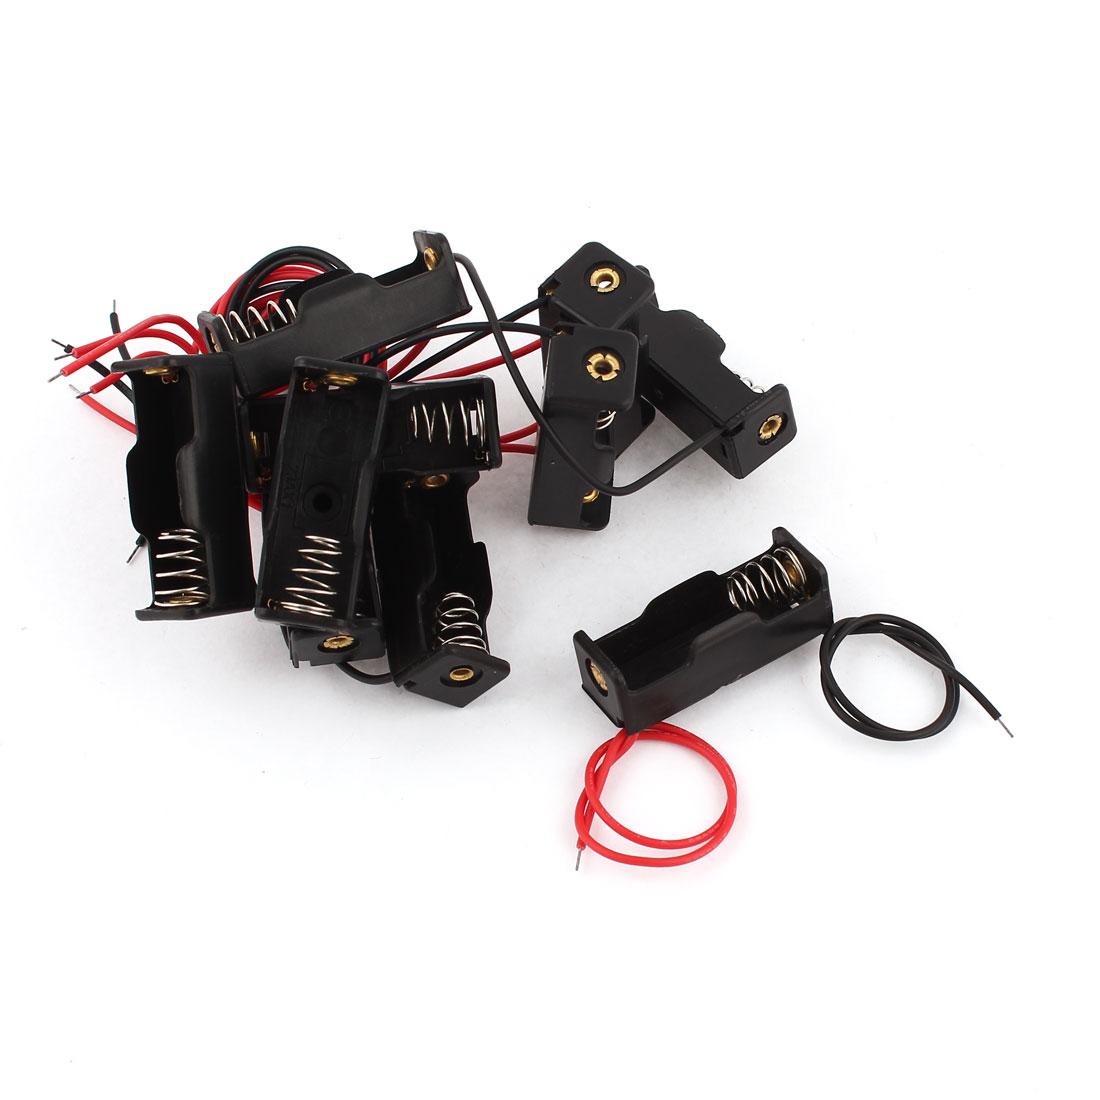 10Pcs 12V 23A Wire Leads Black Plastic Spring Clip Battery Holder